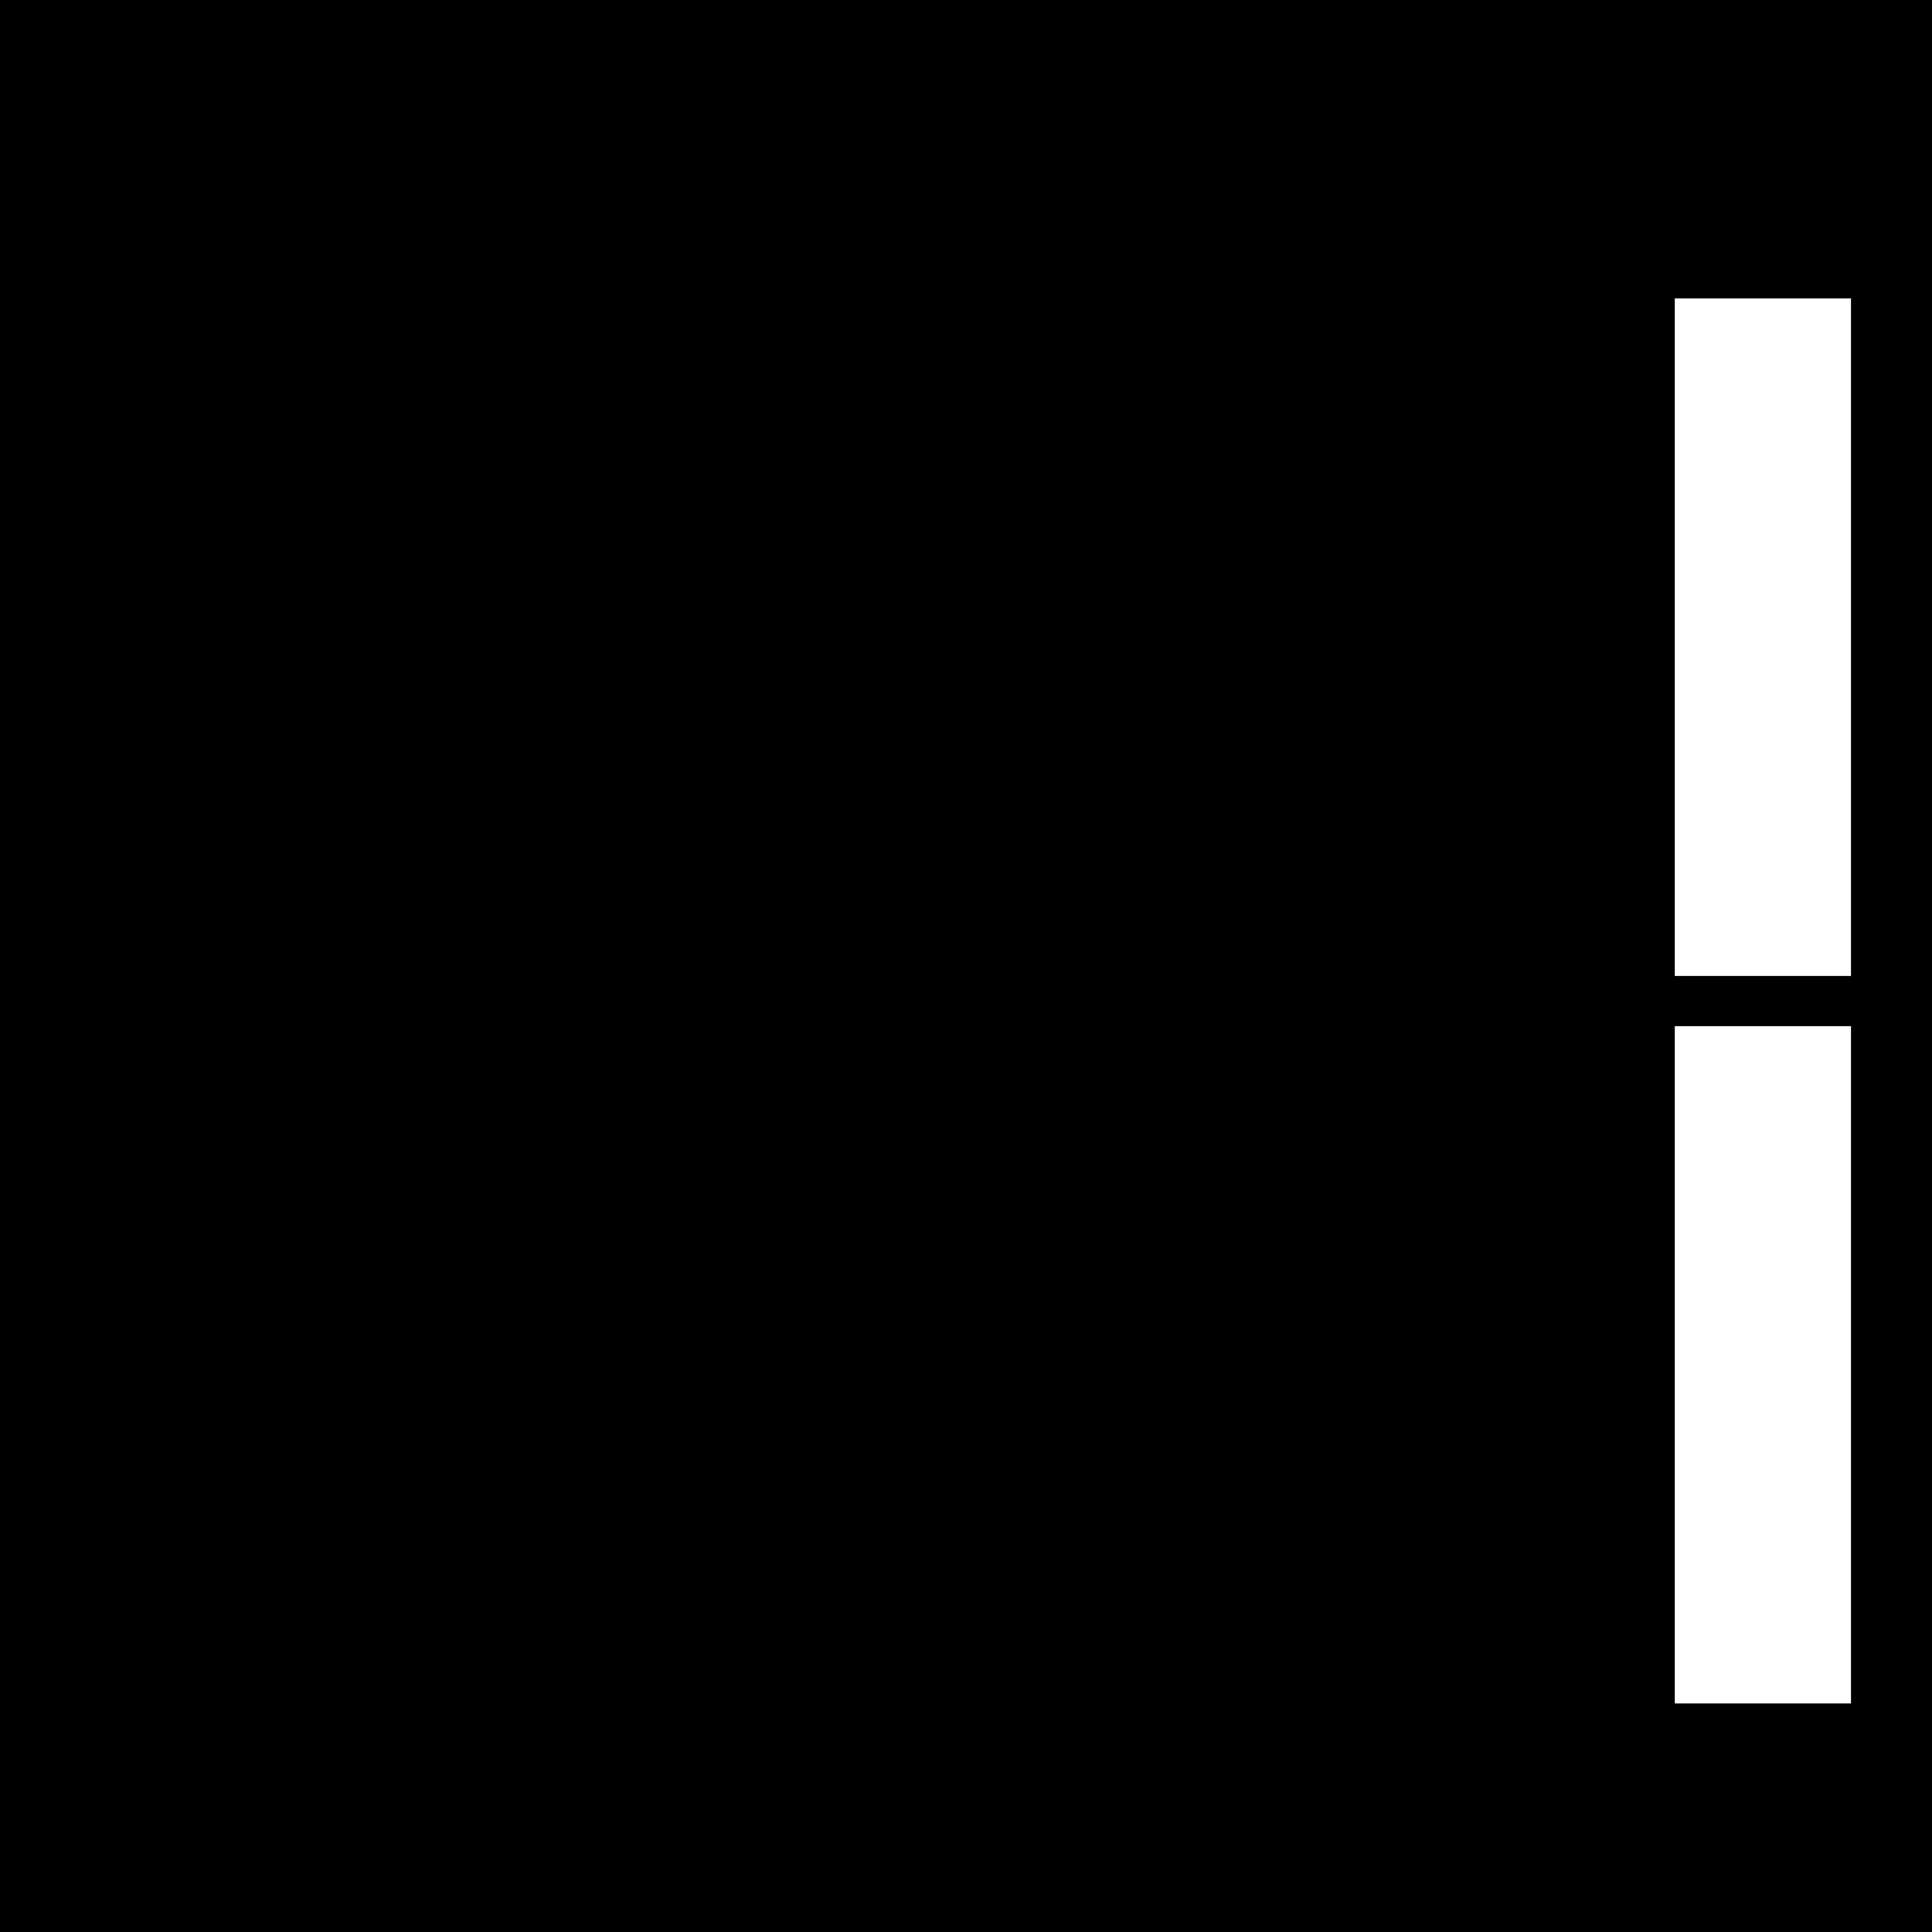 handmade logo 4 ring